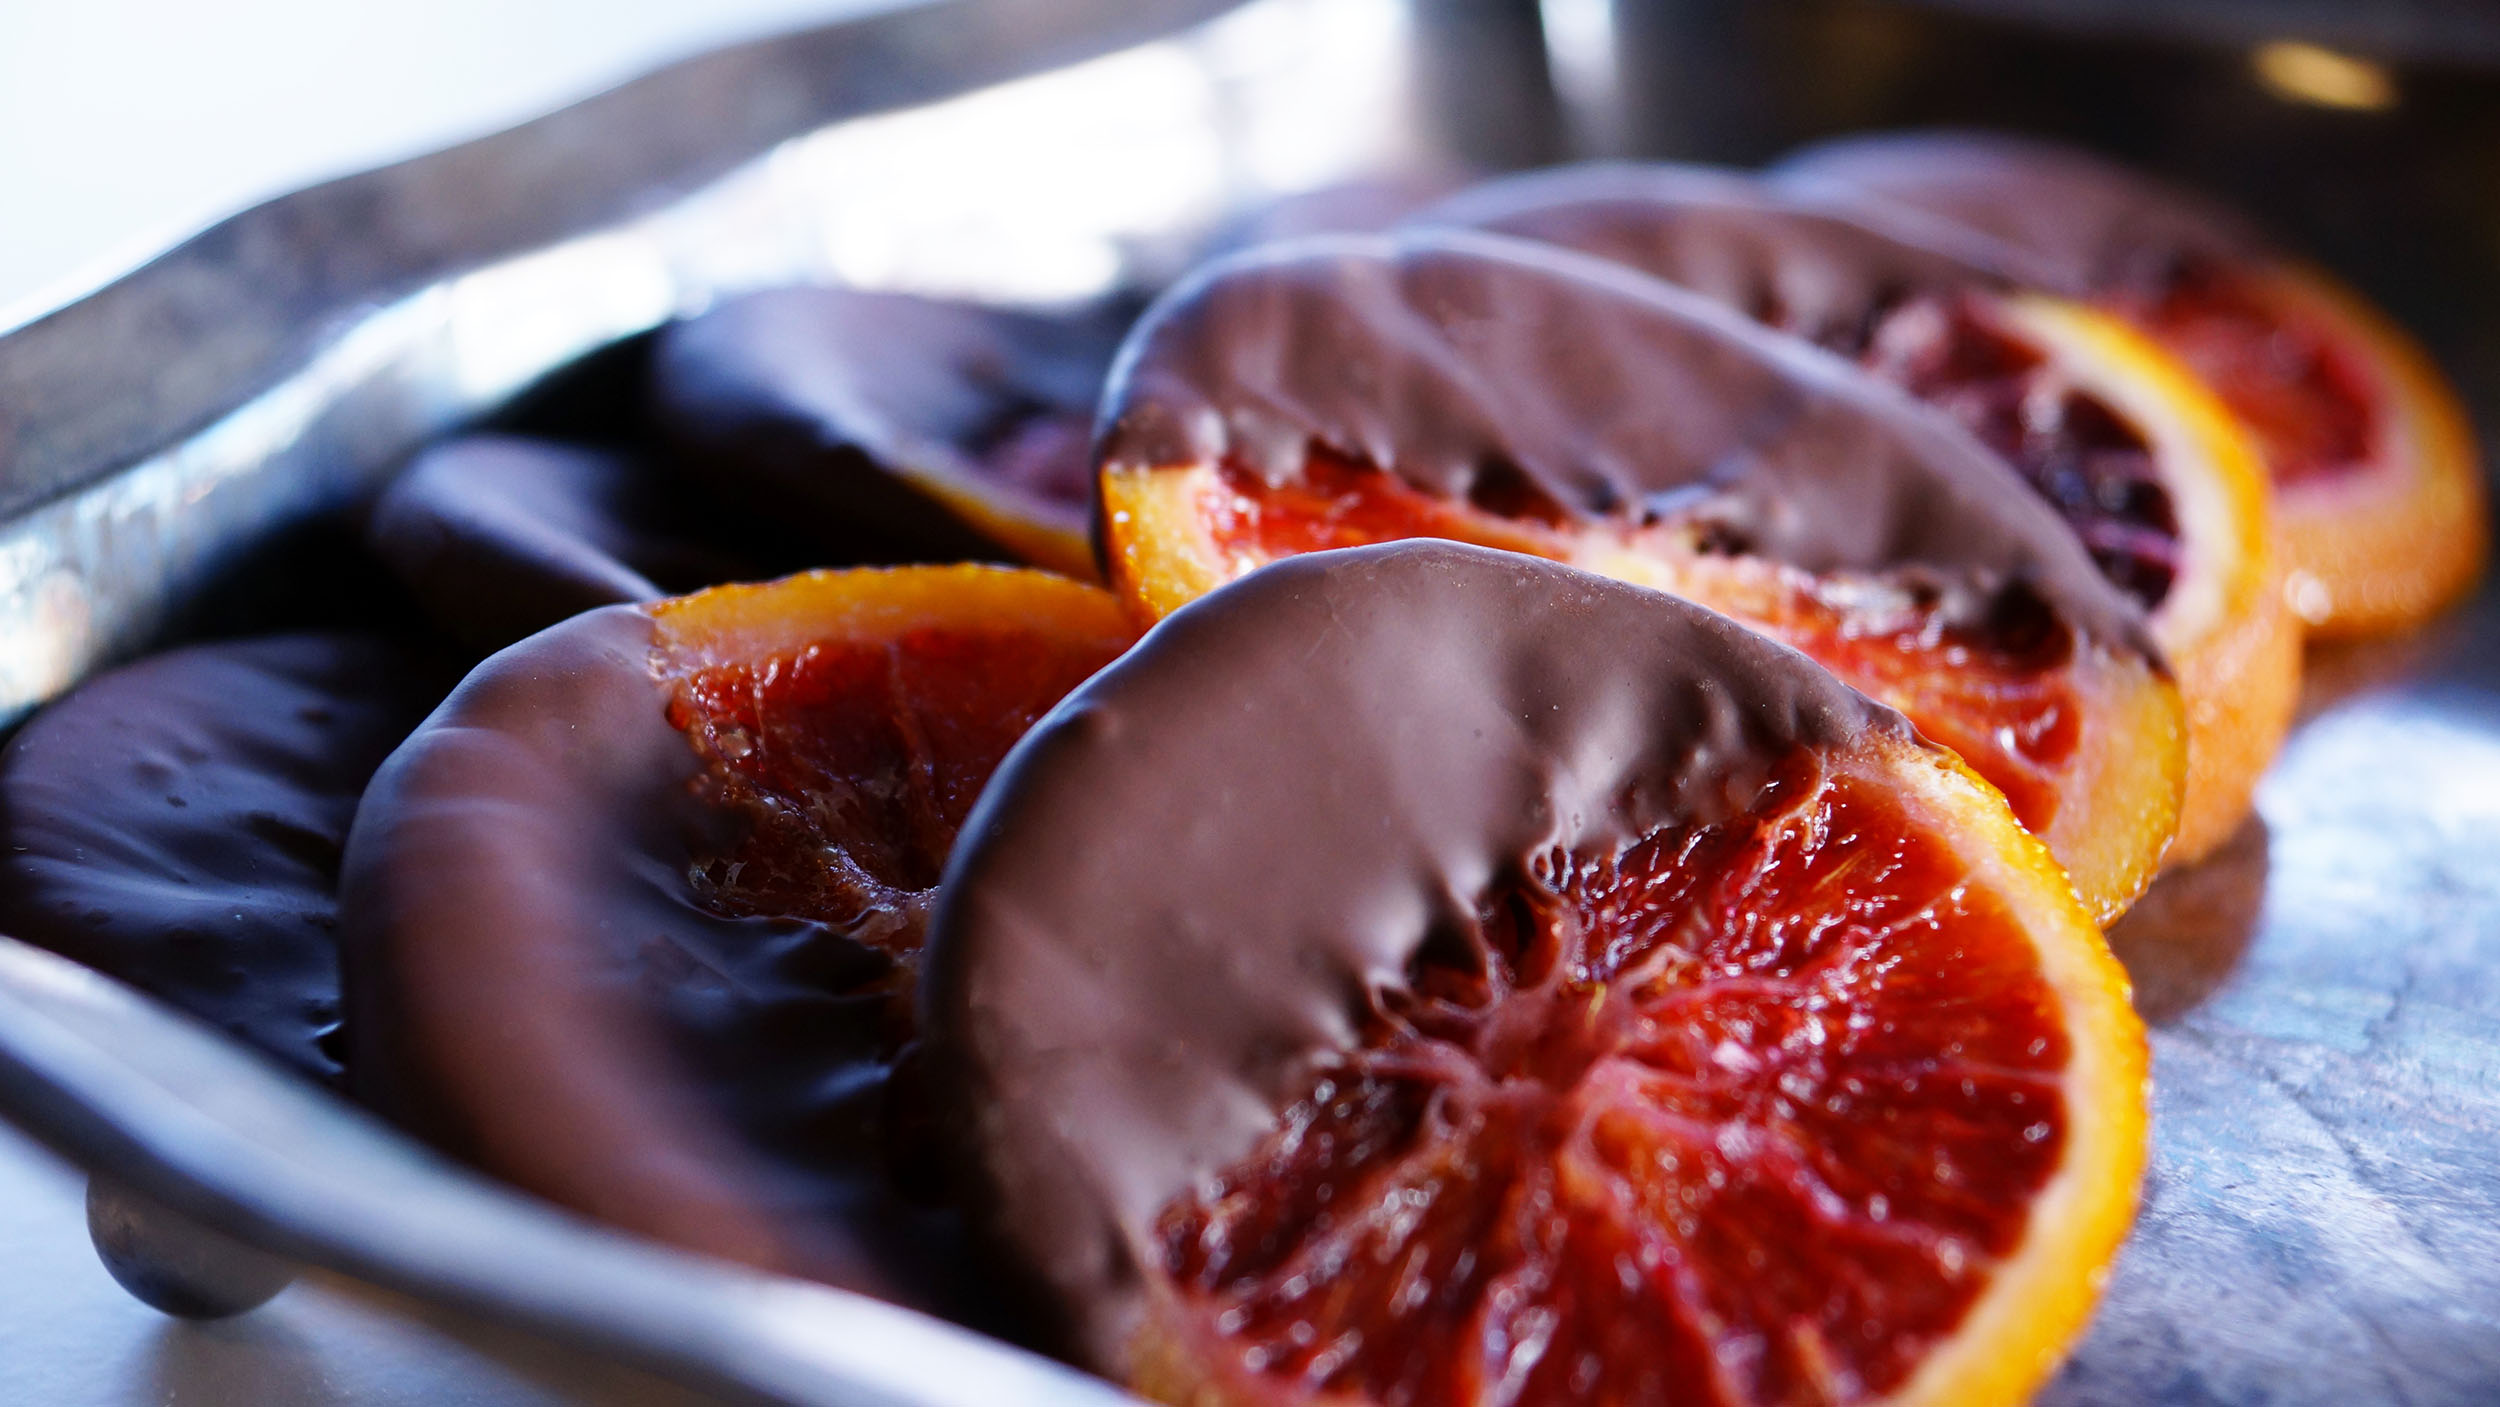 Blood Oranges Dipped A2-Hero-V1.jpg